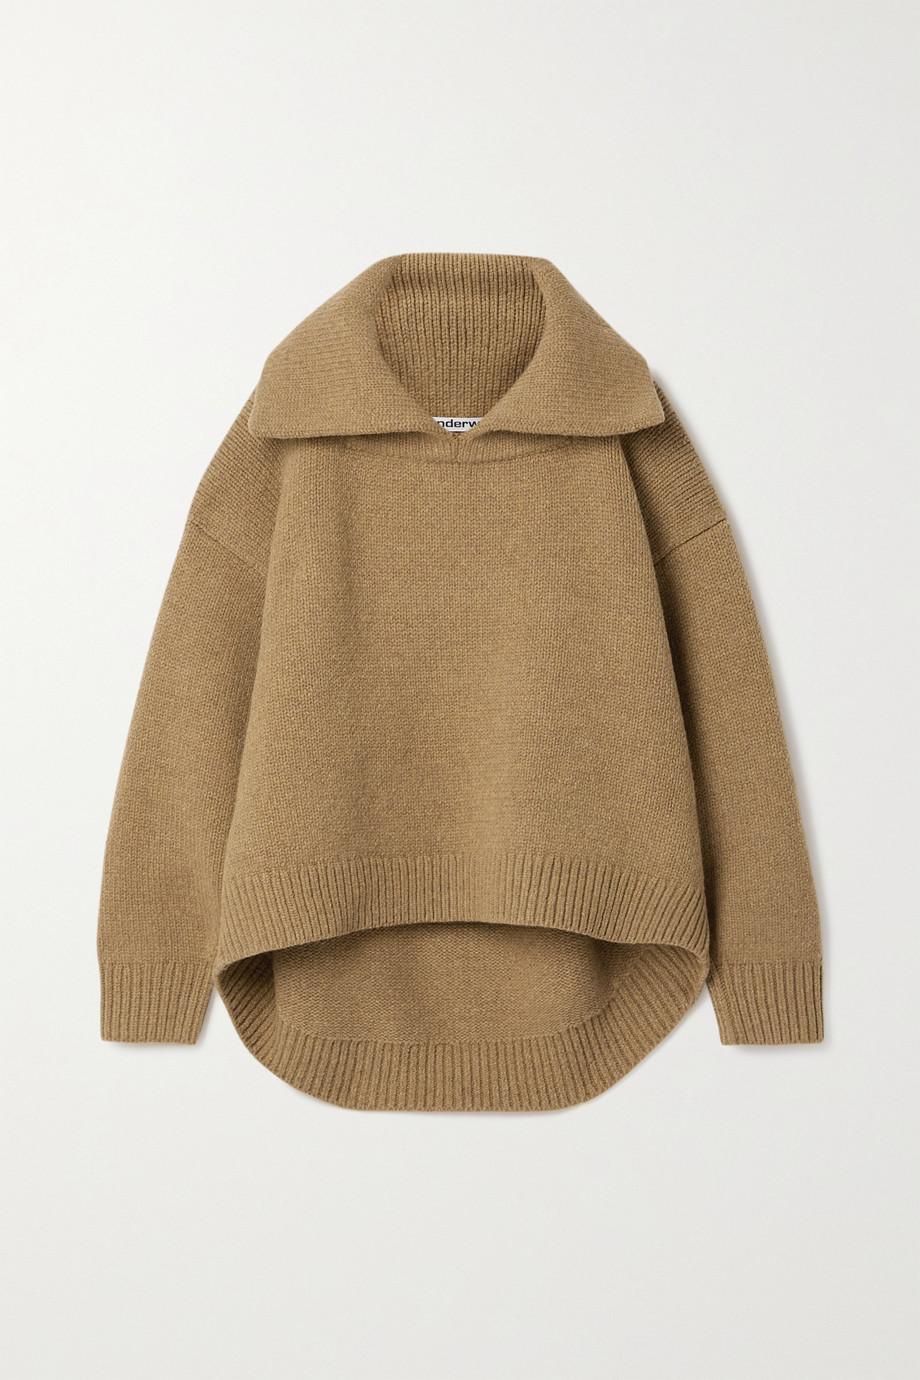 Alexander Wang Oversized-Pullover aus einer Wollmischung